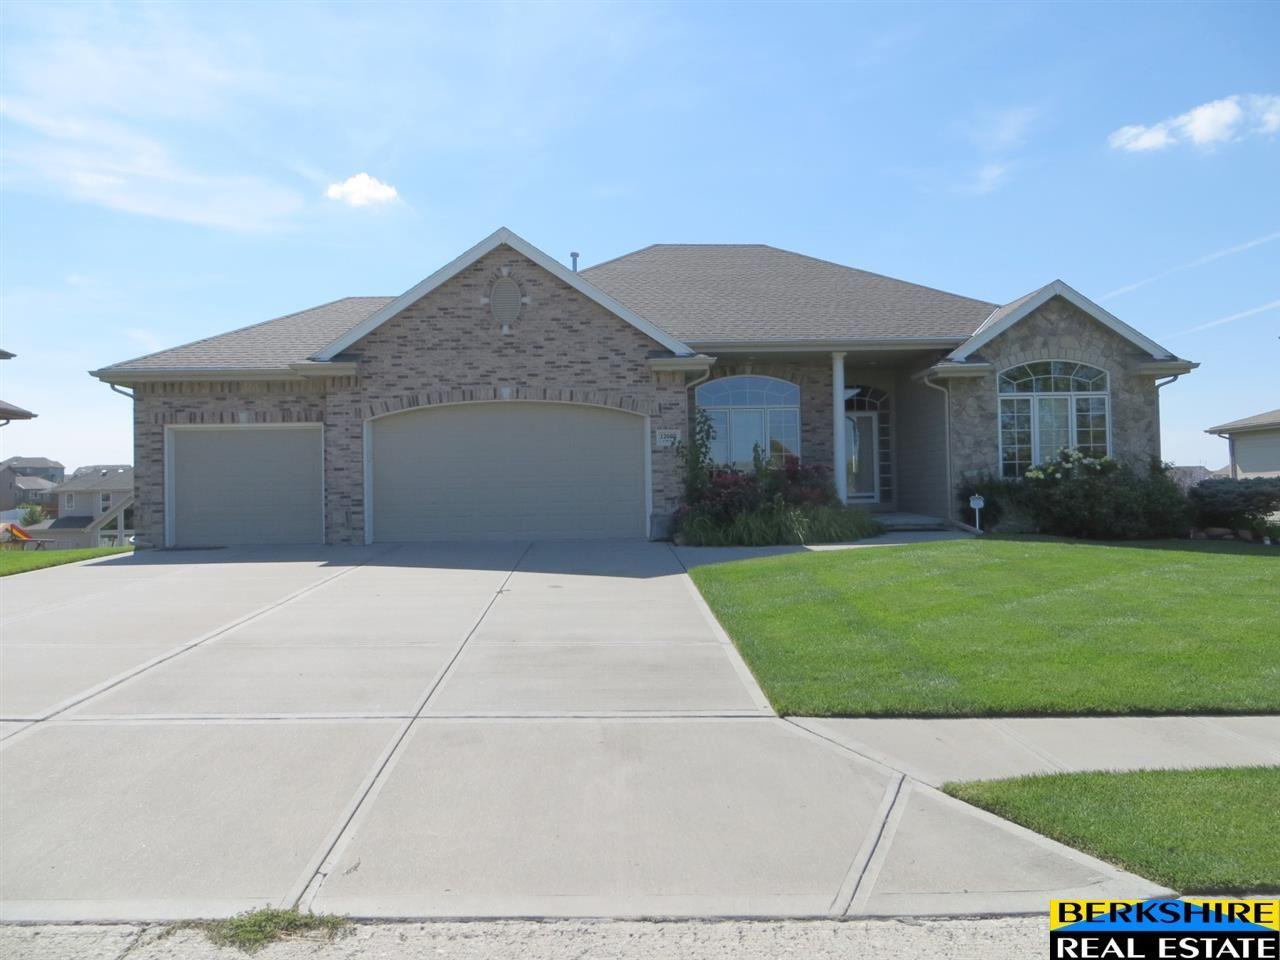 Real Estate for Sale, ListingId: 30072135, Papillion,NE68046